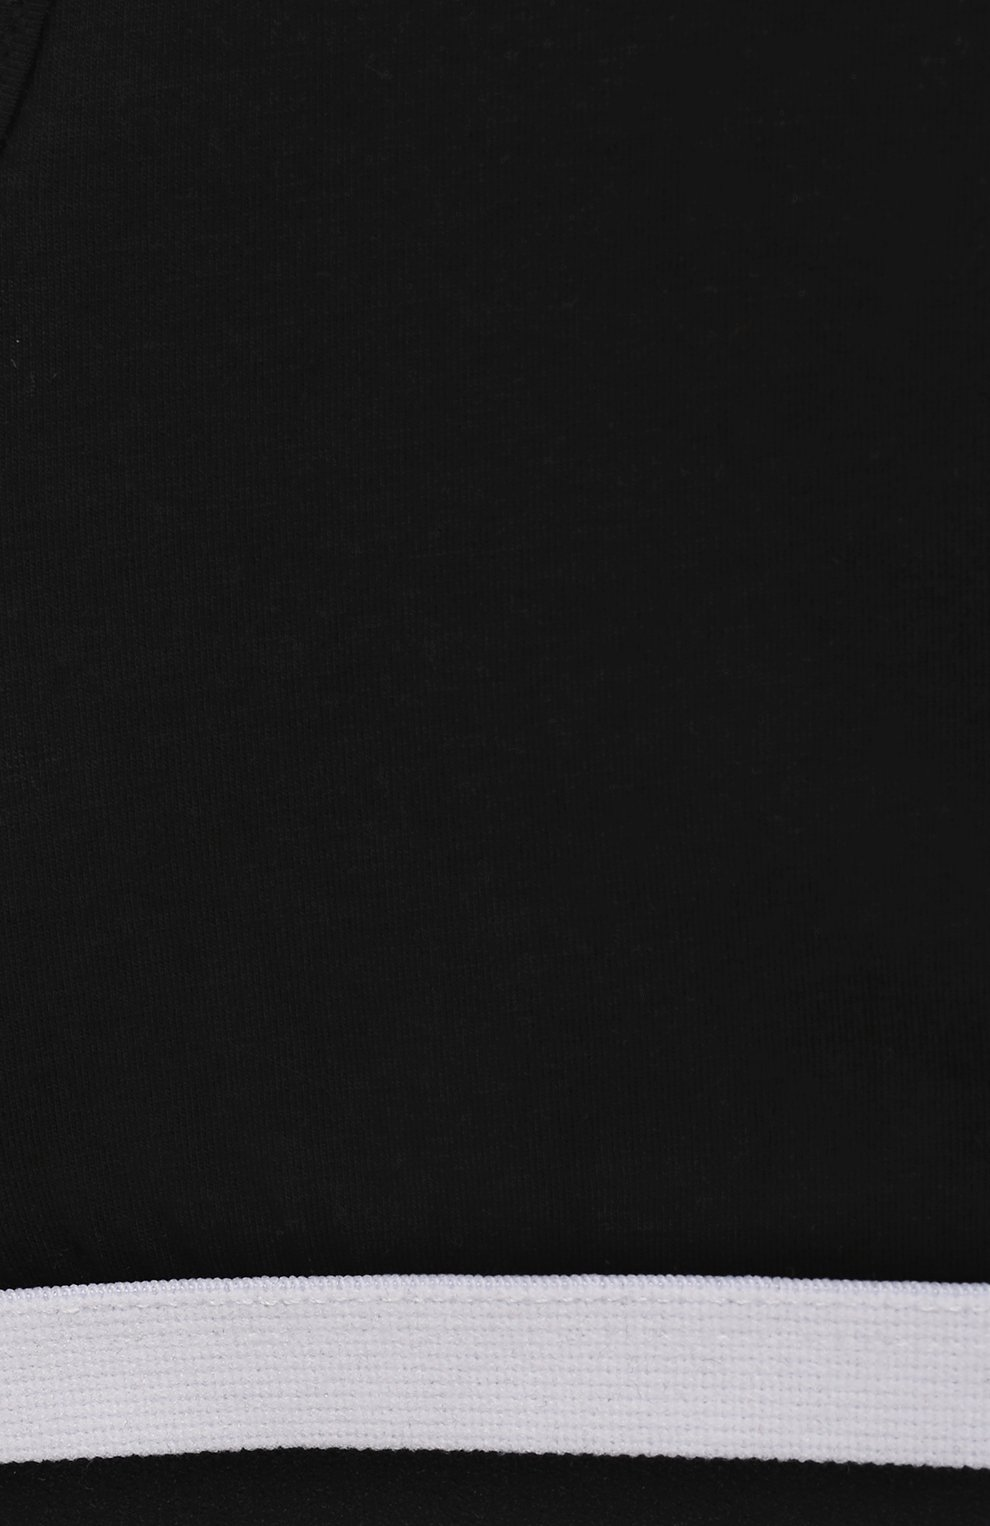 Детский бра-топ SANETTA черного цвета, арт. 346632 | Фото 3